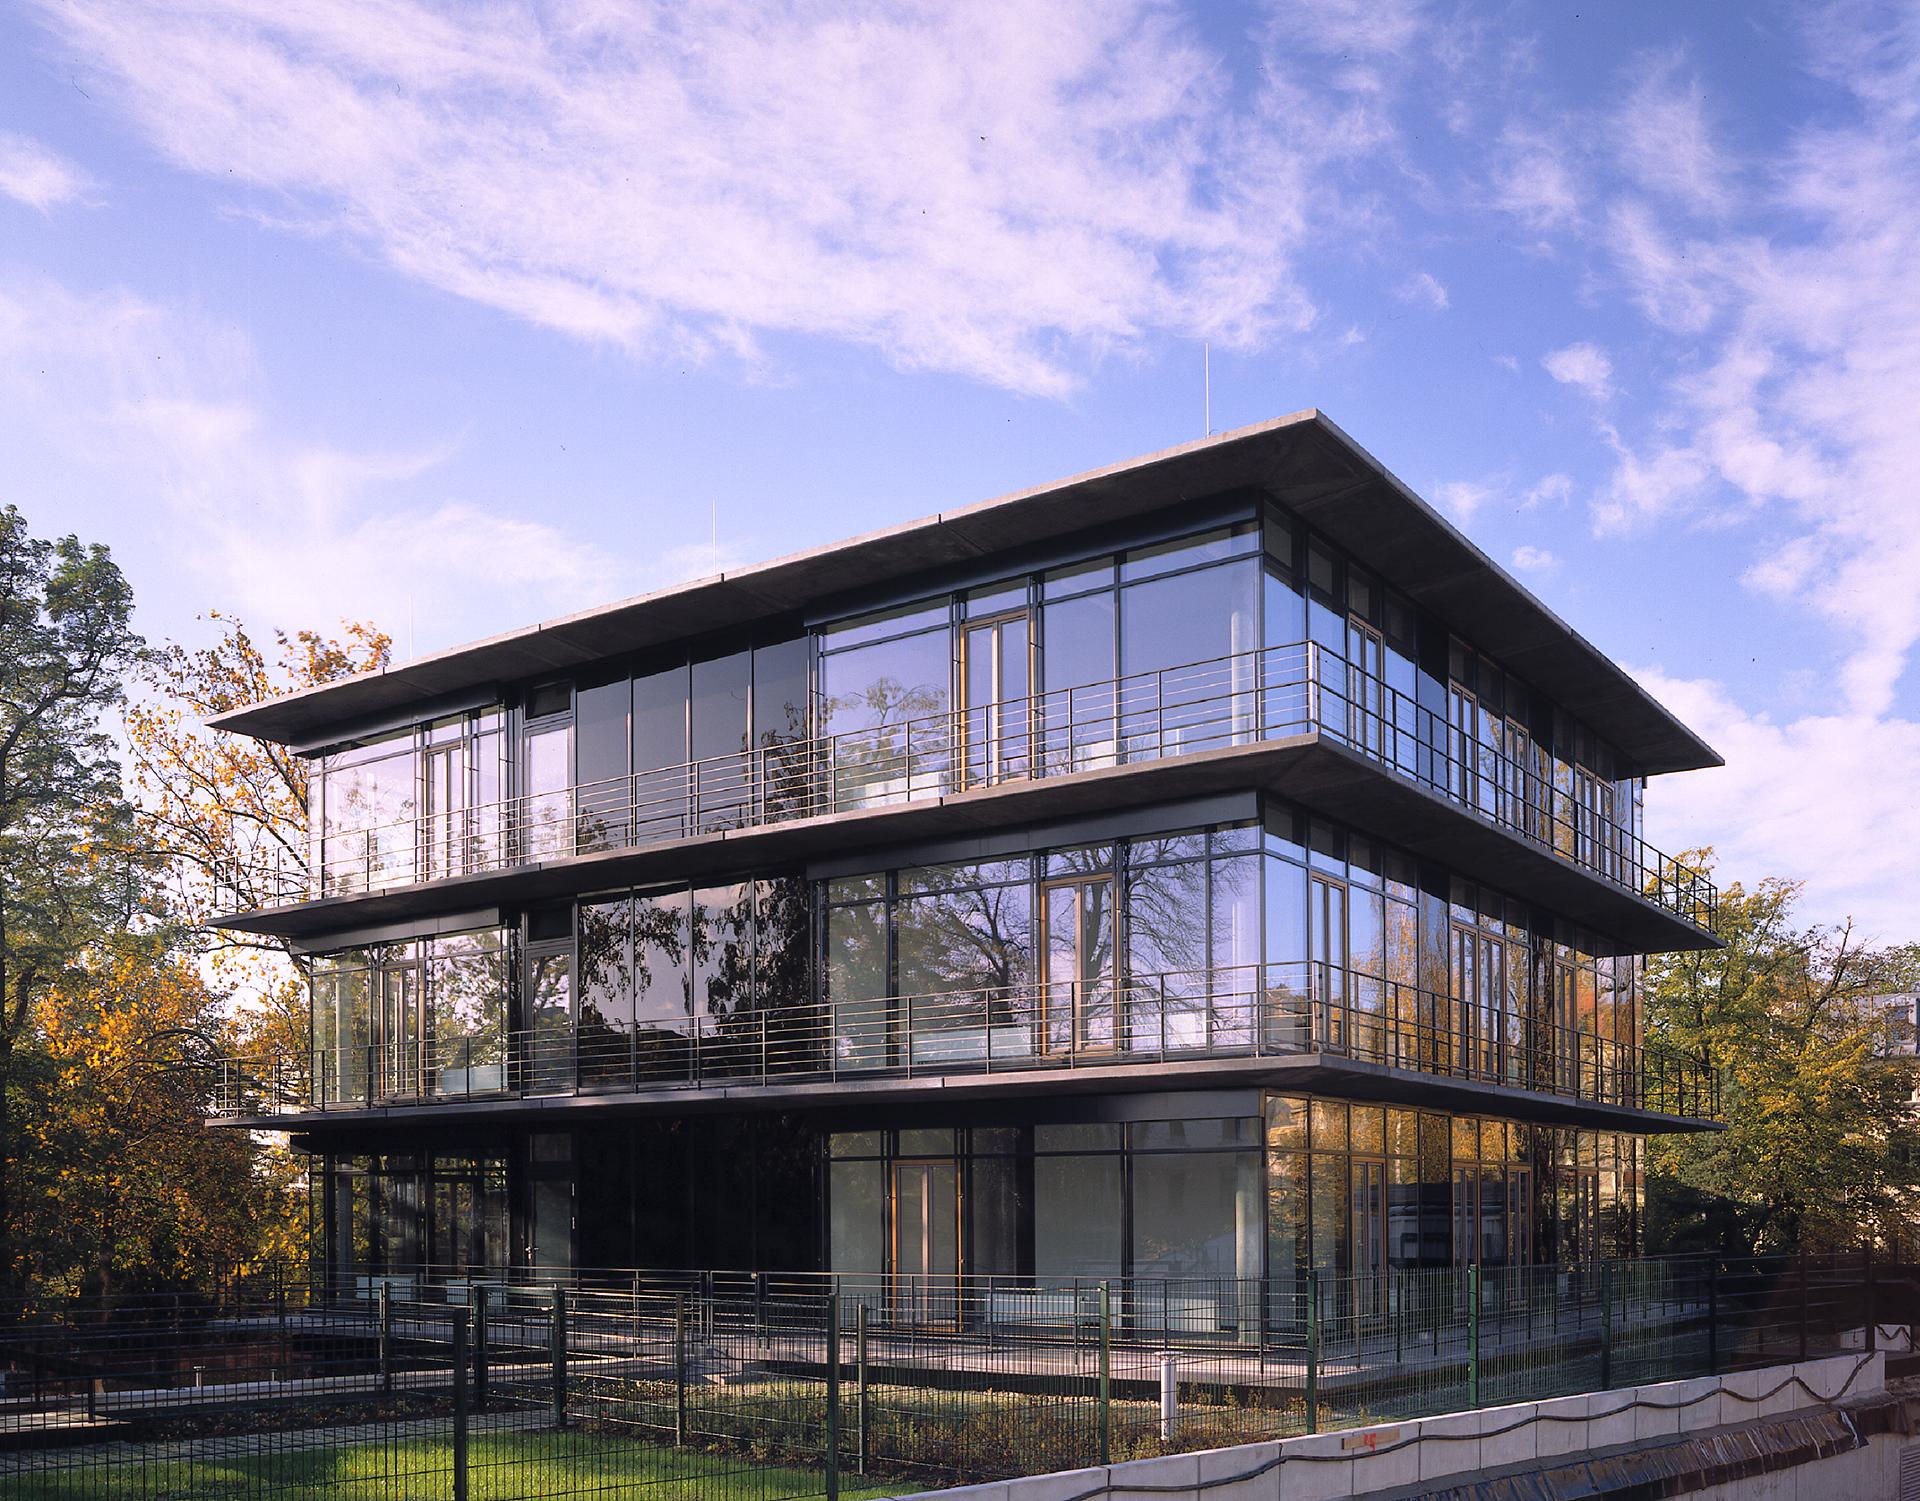 ksg architekten max planck institut 1 ba halle. Black Bedroom Furniture Sets. Home Design Ideas